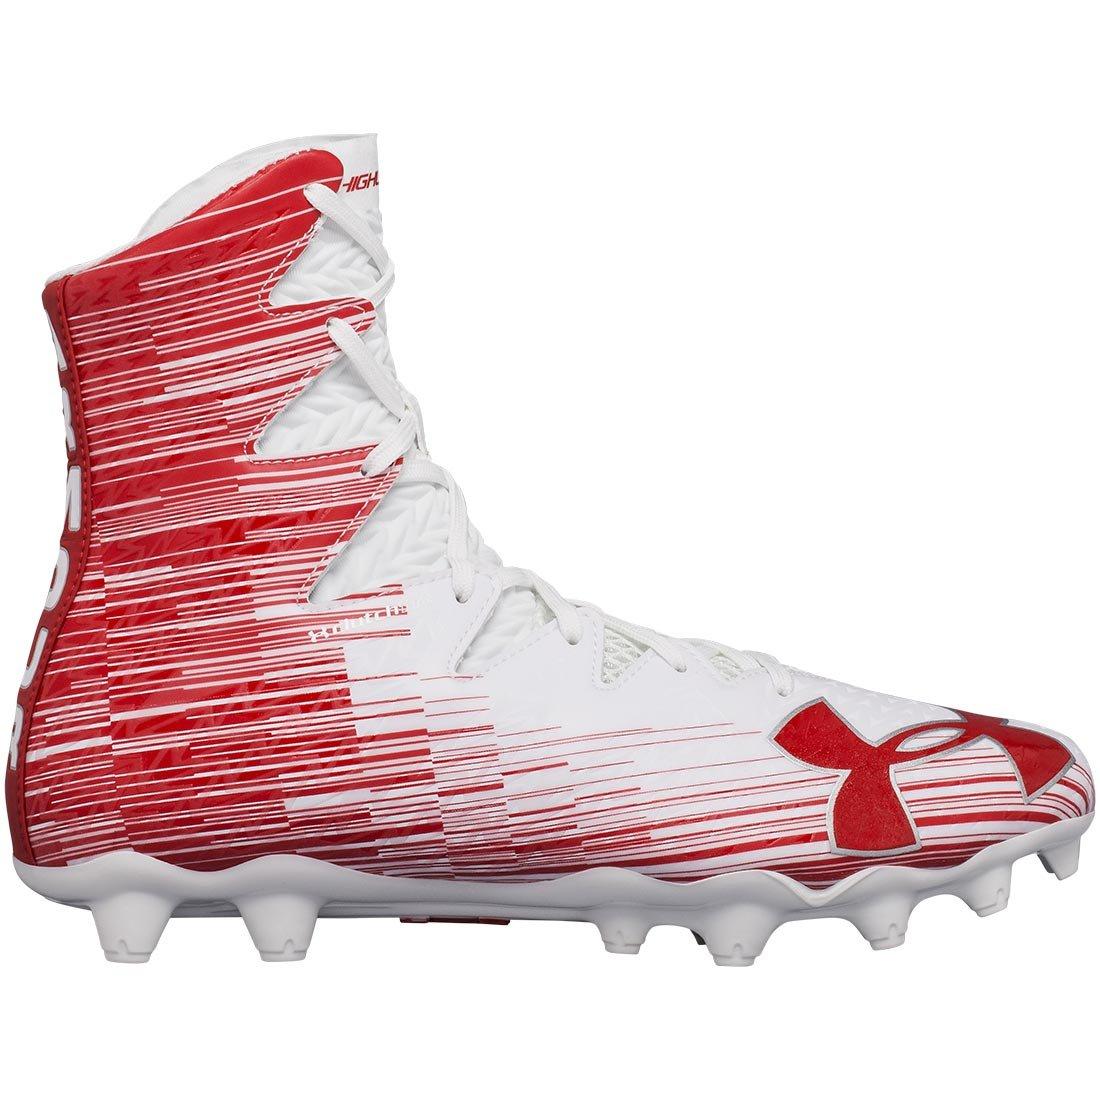 Under Armour Men's Highlight M.C. Lacrosse Shoe, White (161)/Red, 8